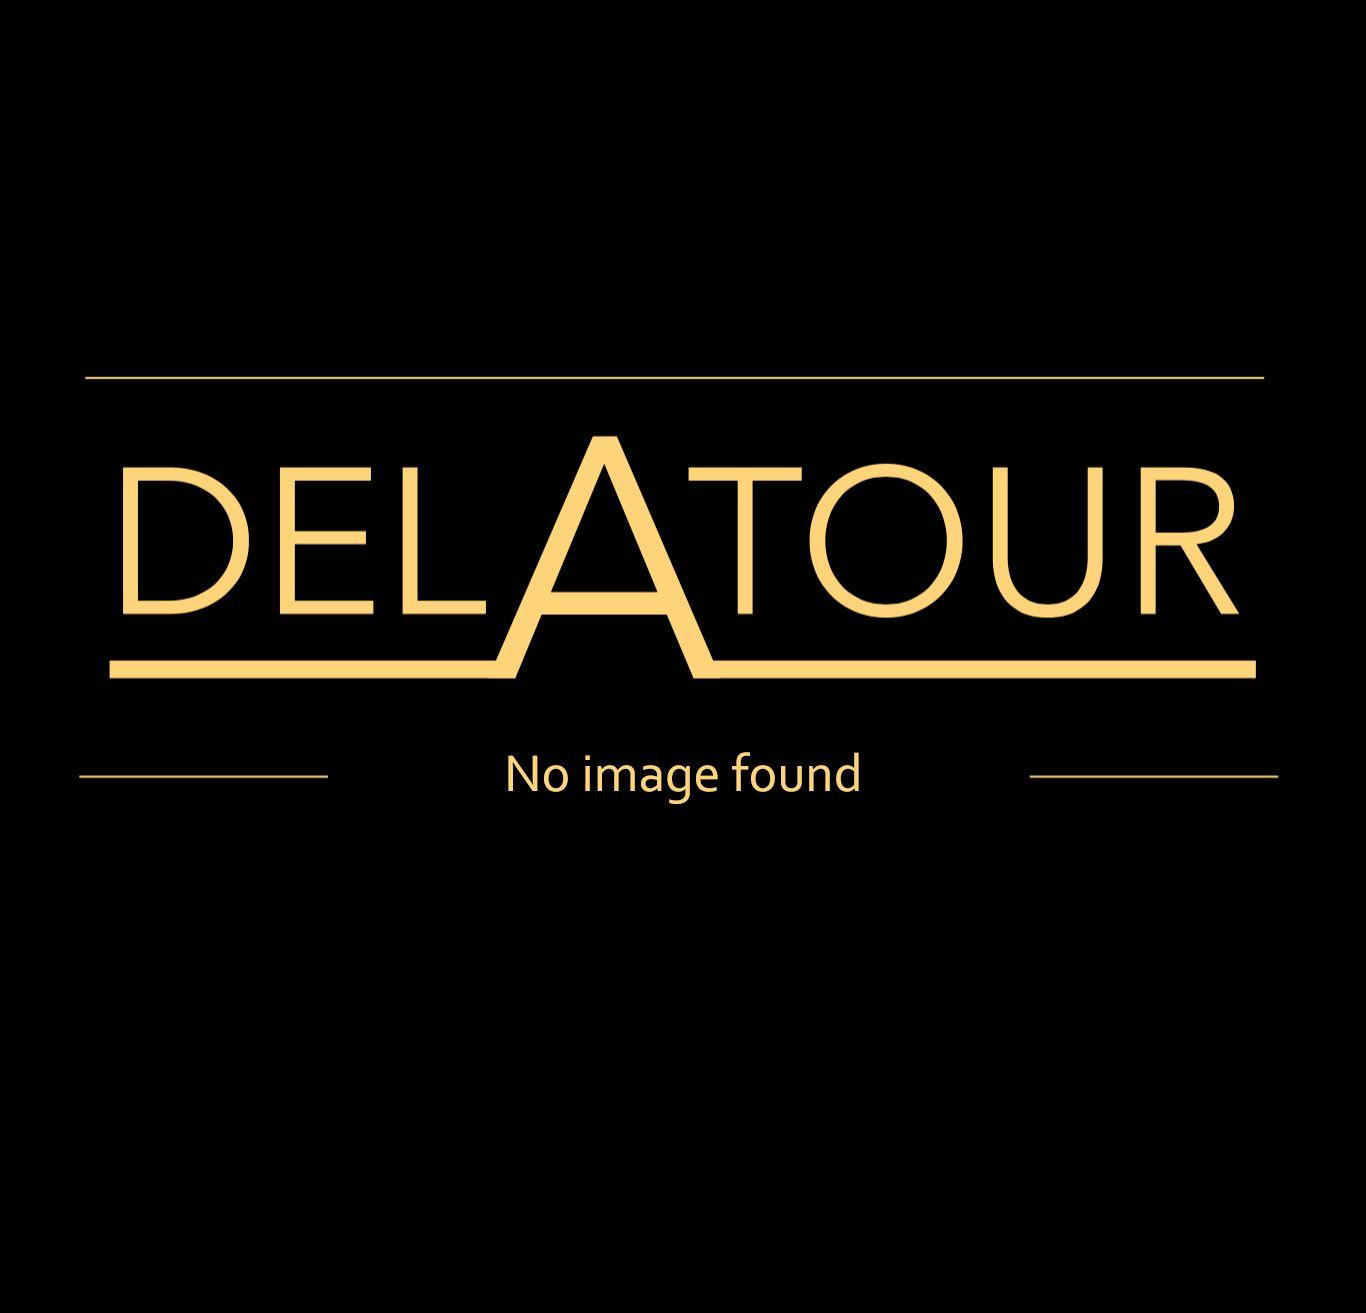 Aston Martin Vantage #76 J. Dennis DTM 2019